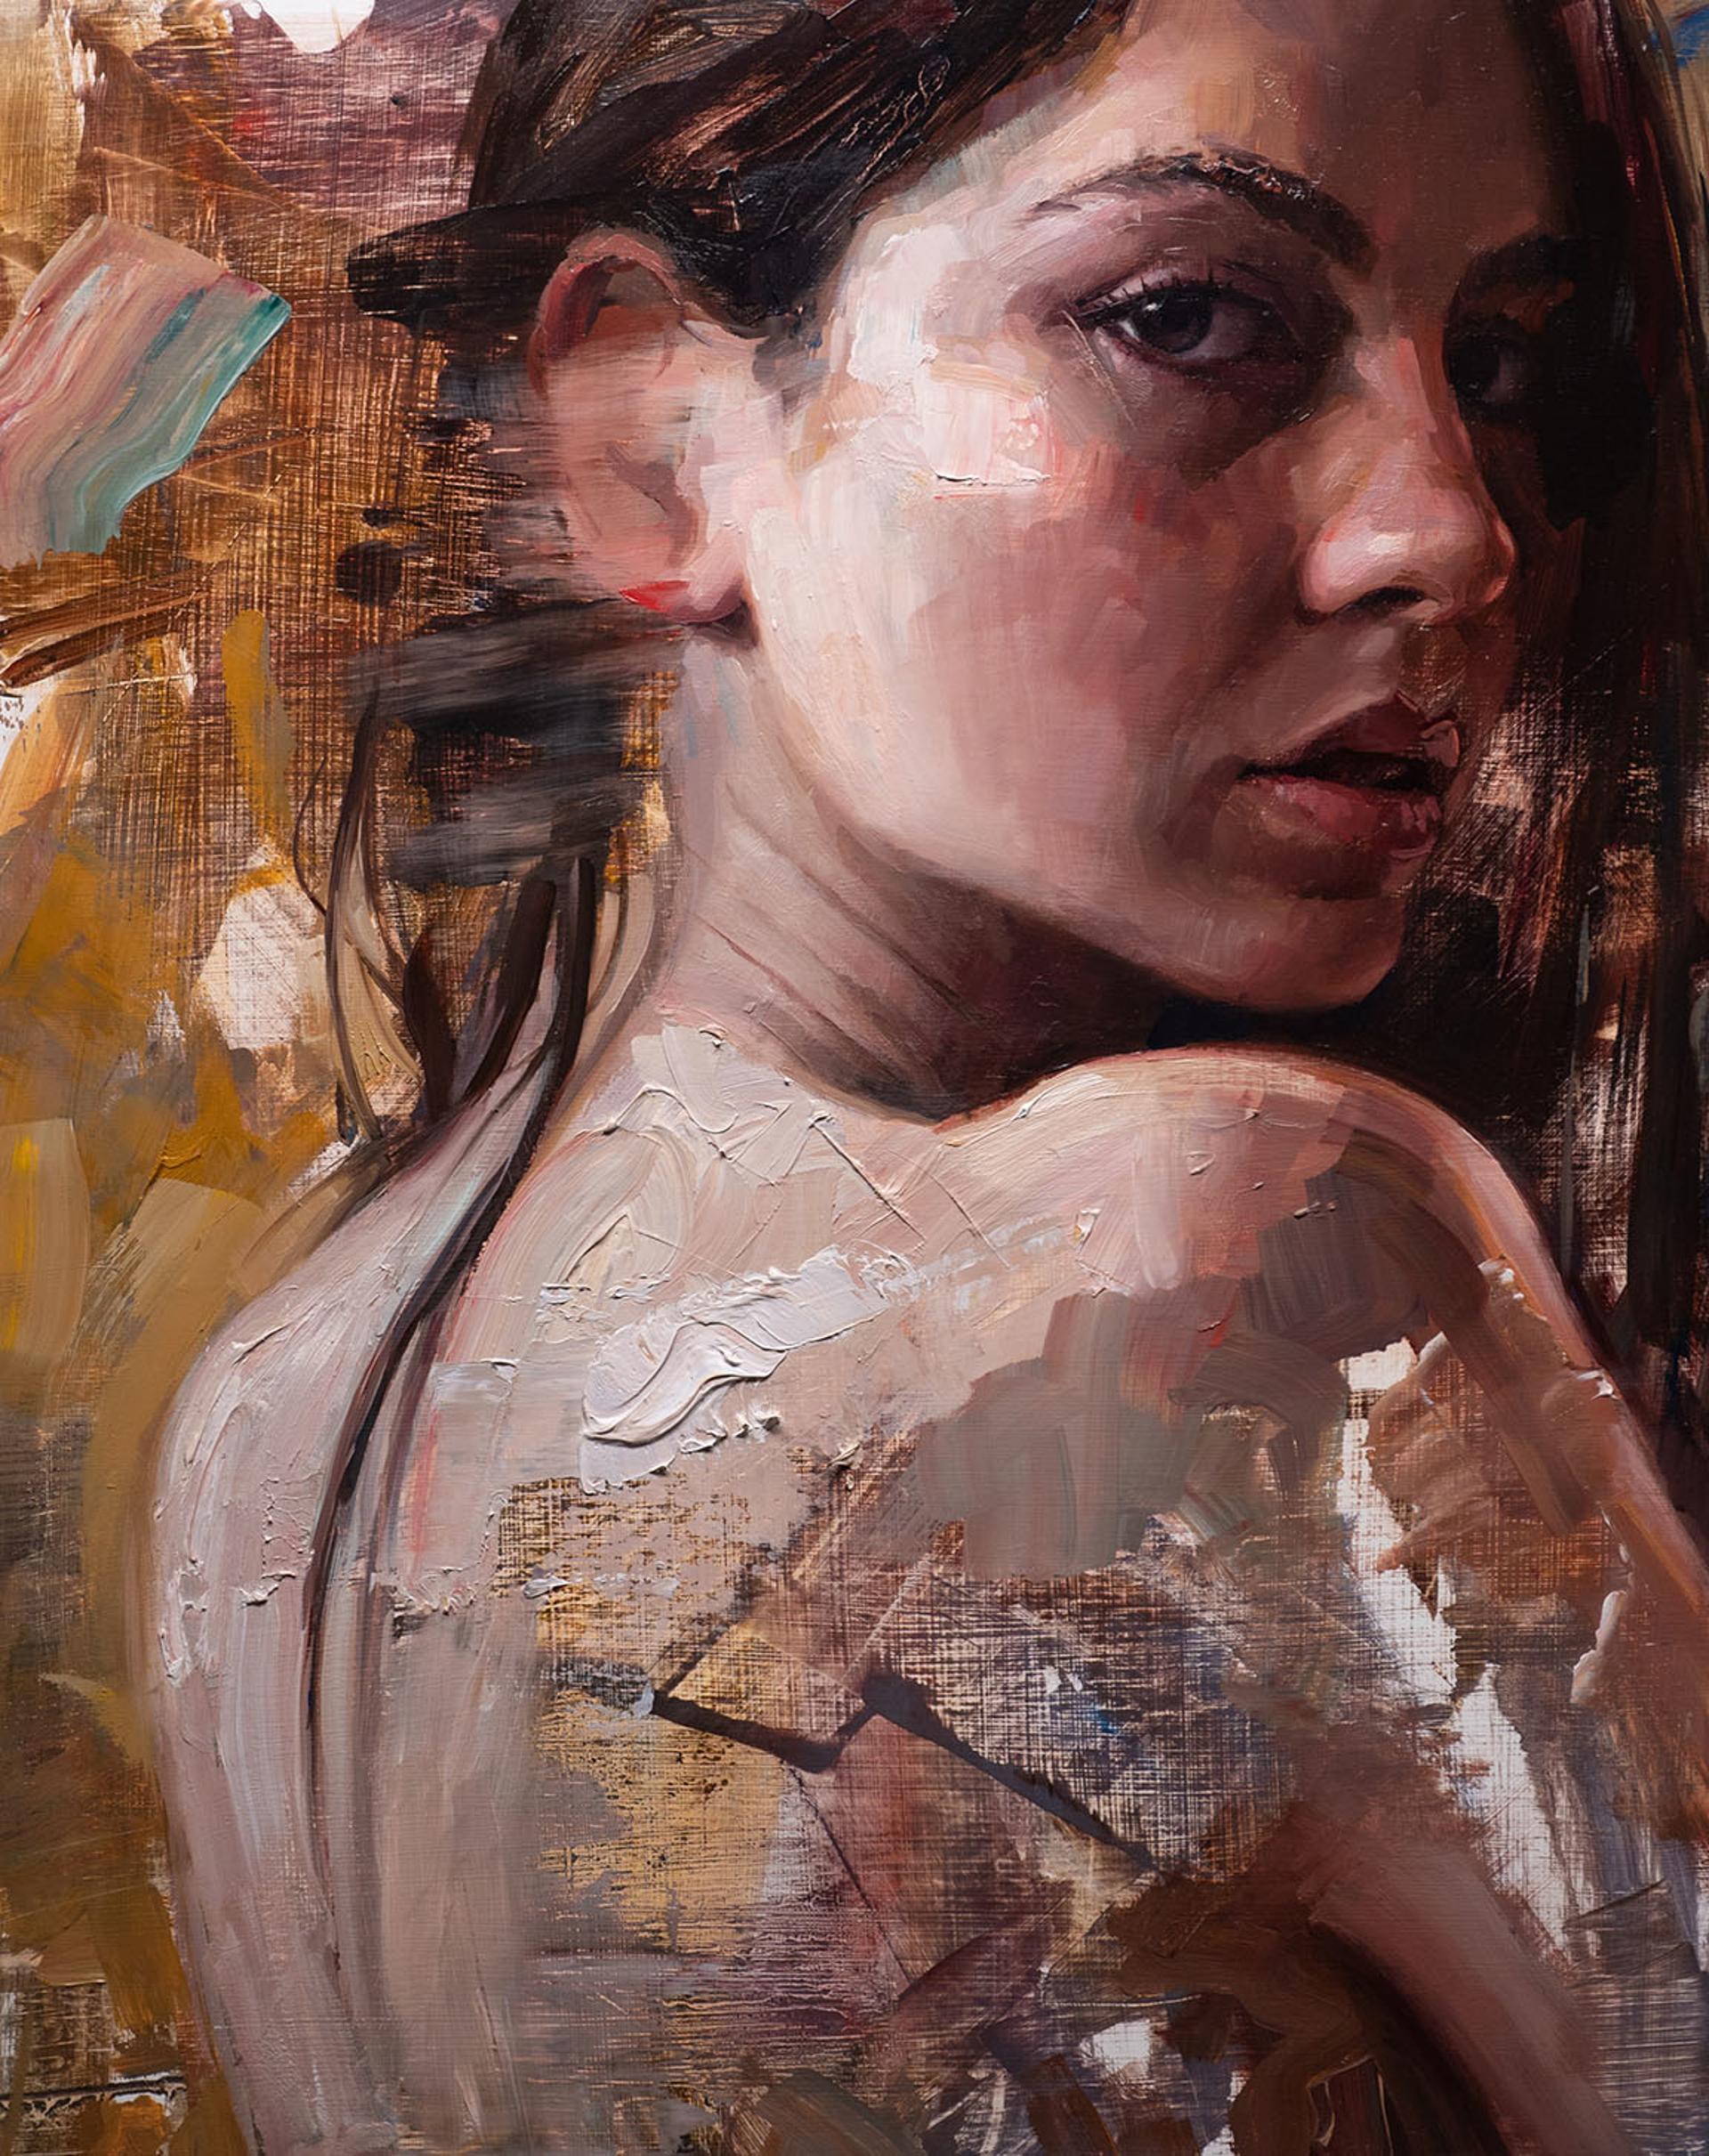 Letting Go by Matt Talbert